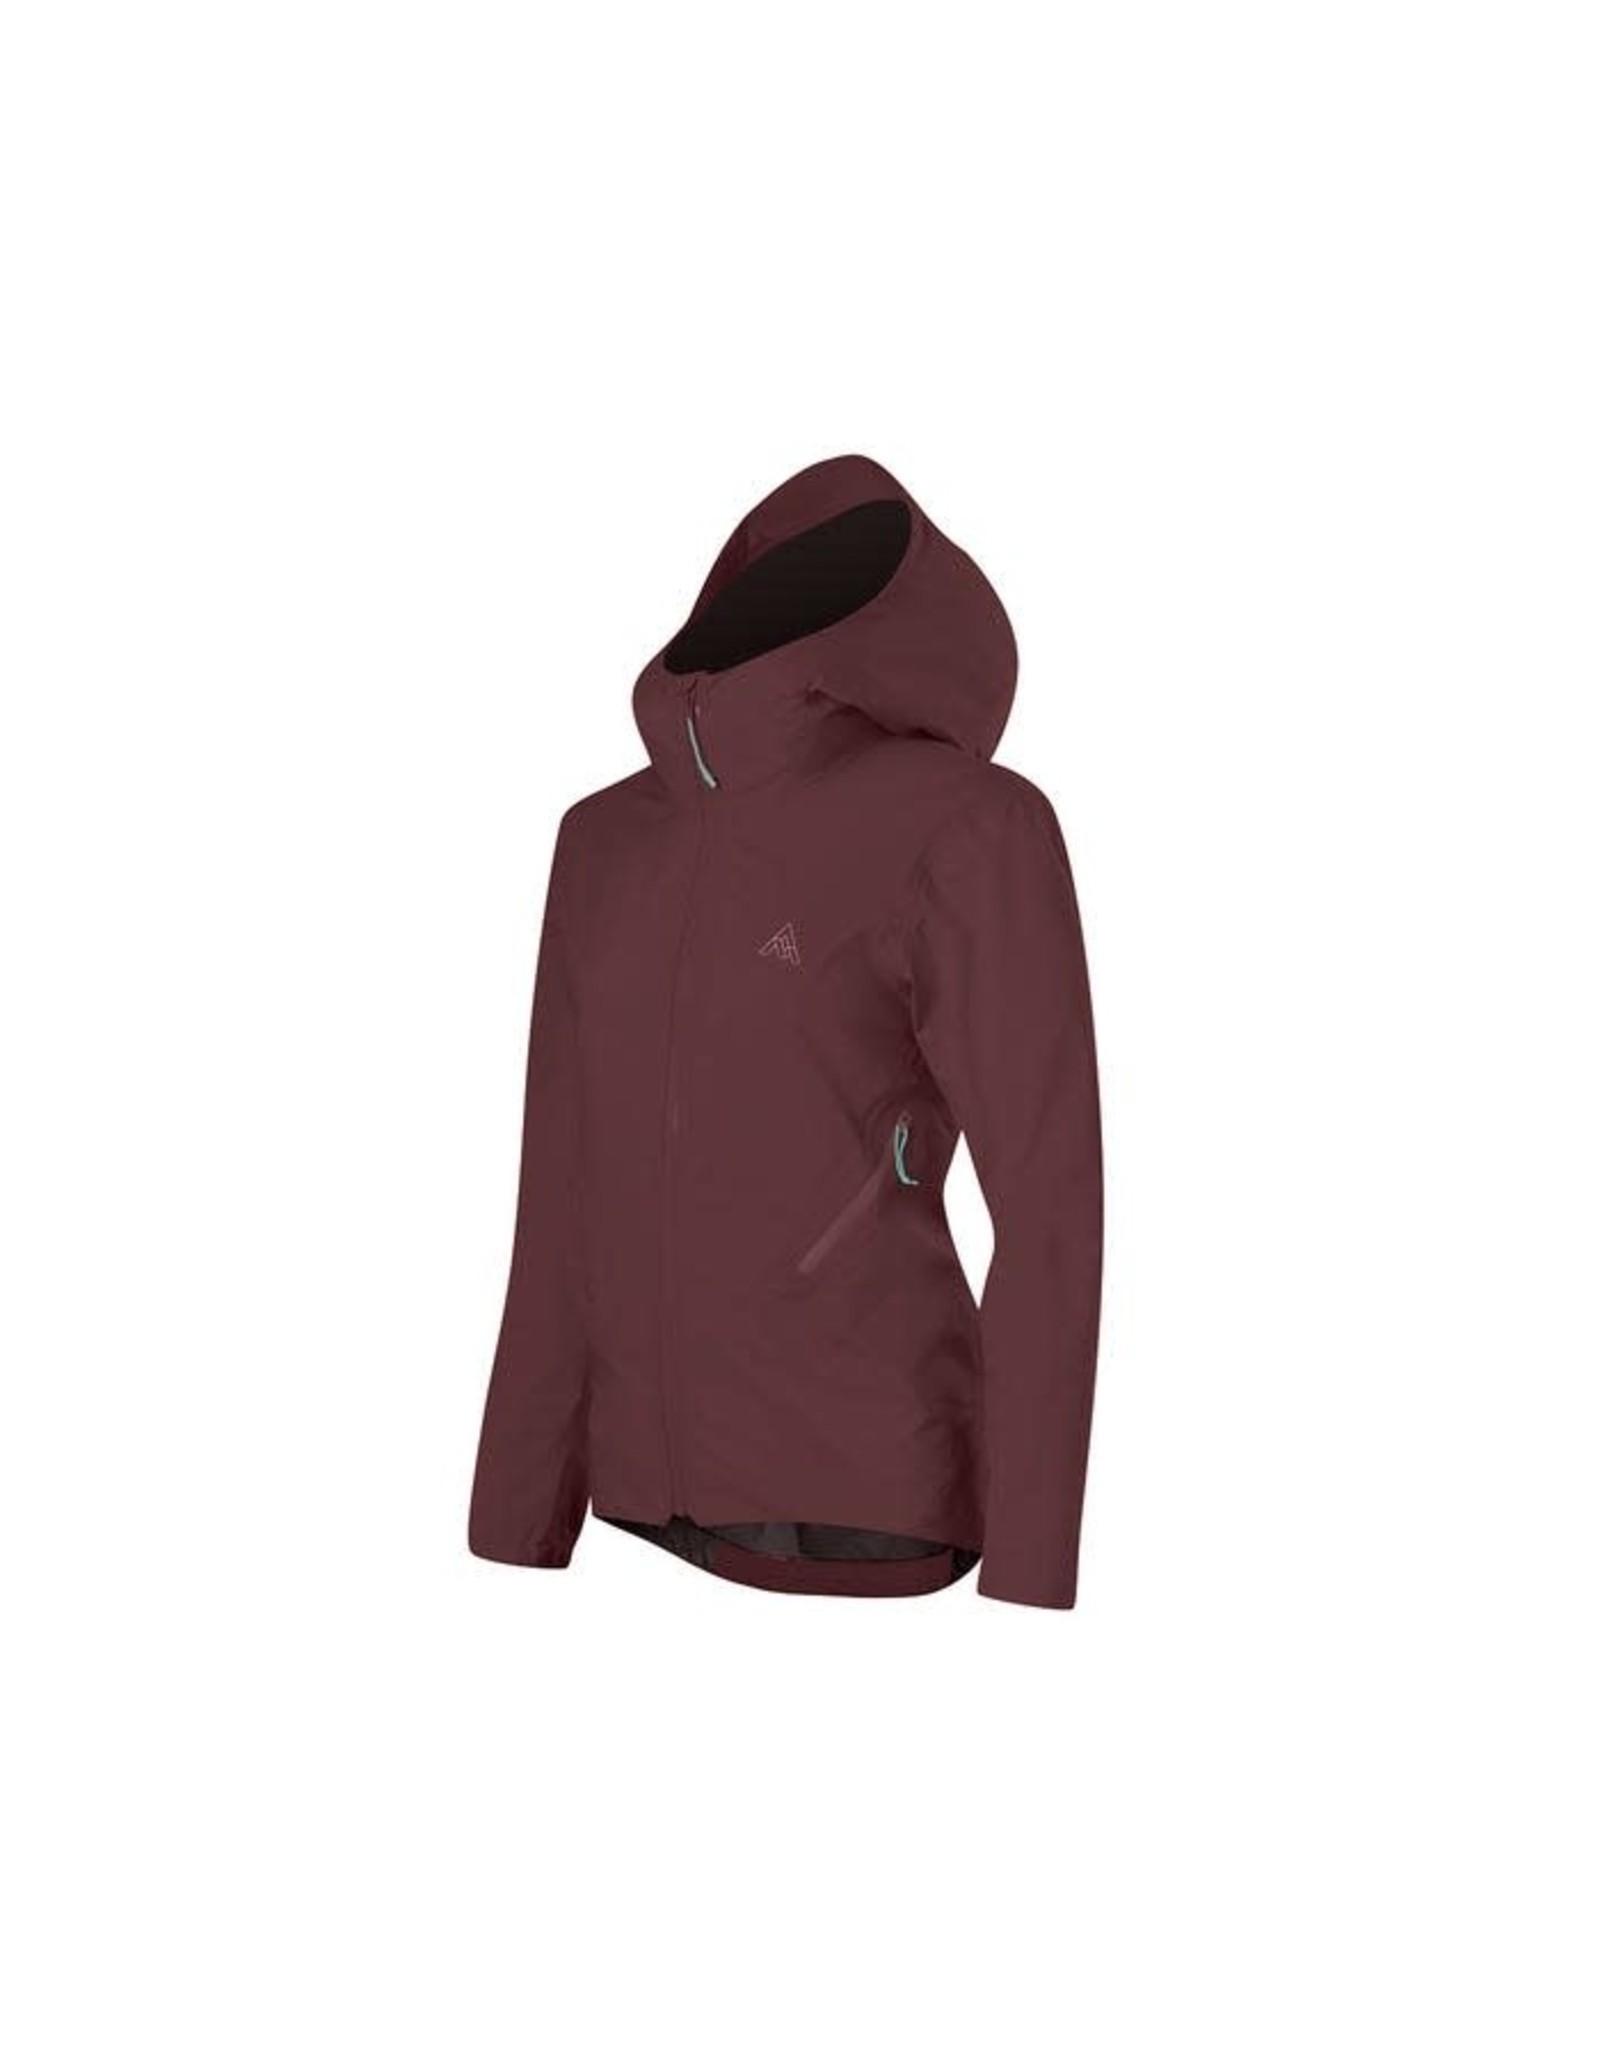 7MESH 7MESH - Copilot Jacket Port Women's Small